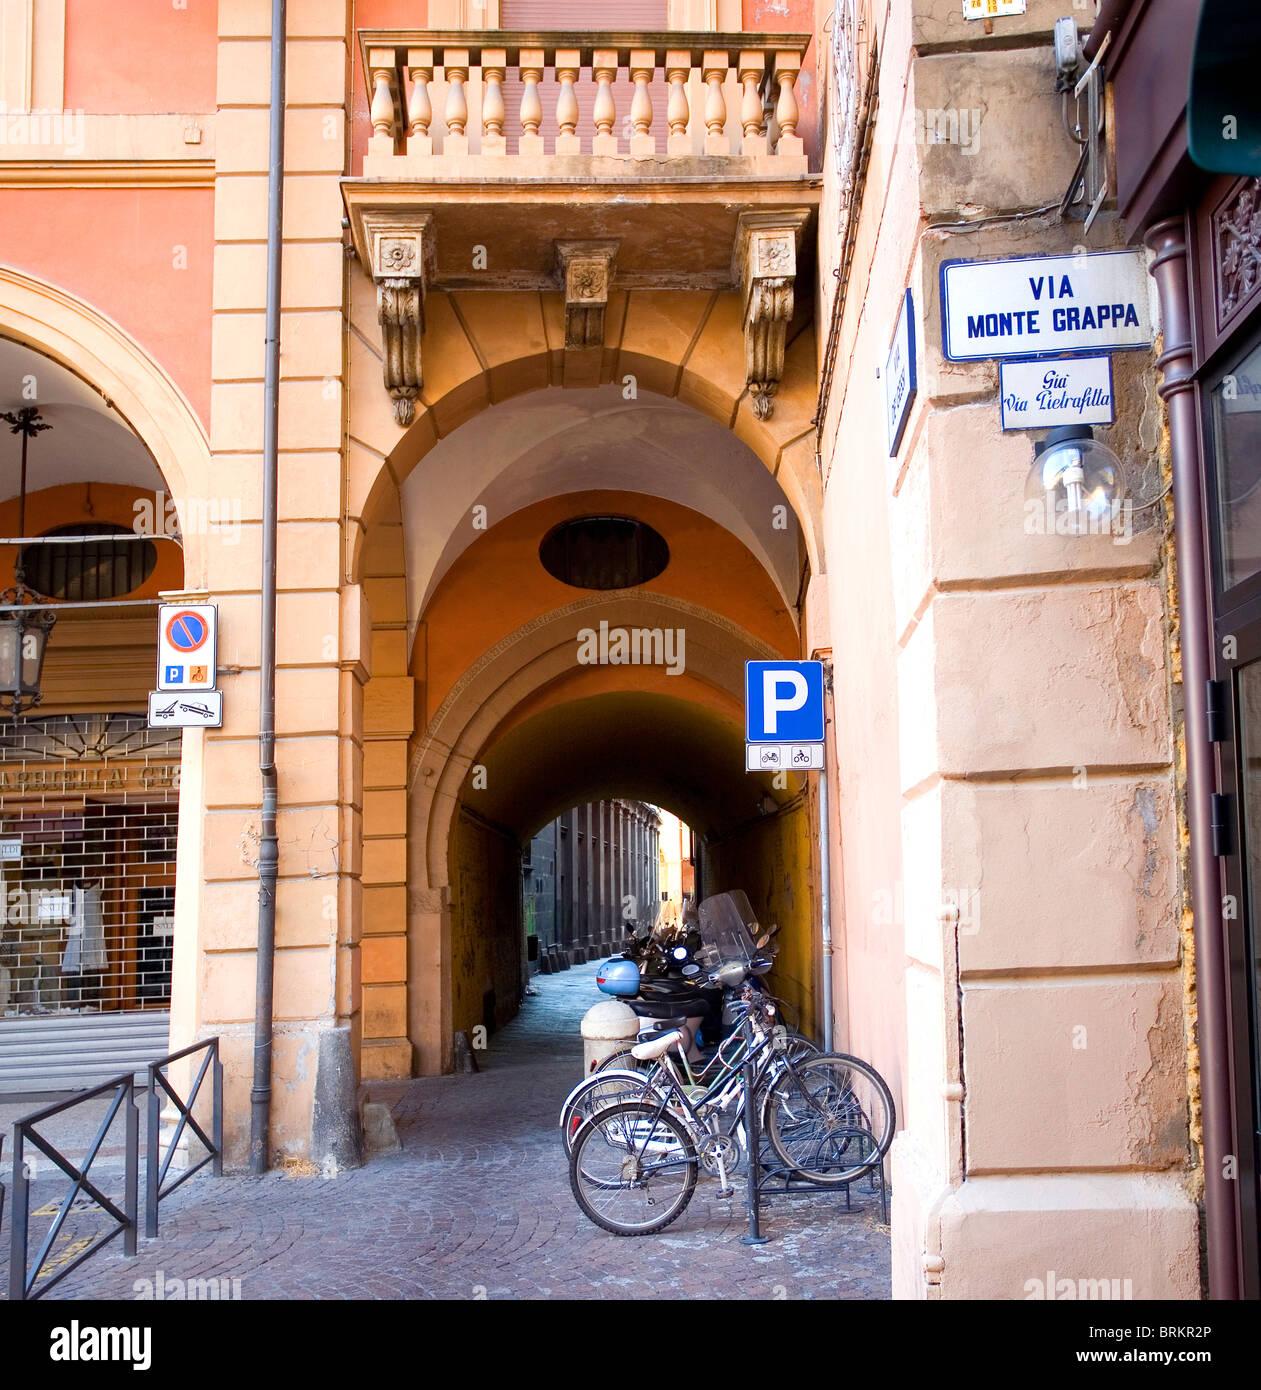 Via Monte Grappa con bicicletas aparcadas- una típica calle arqueada en Bolonia, Emilia-Romaña, Italia Foto de stock